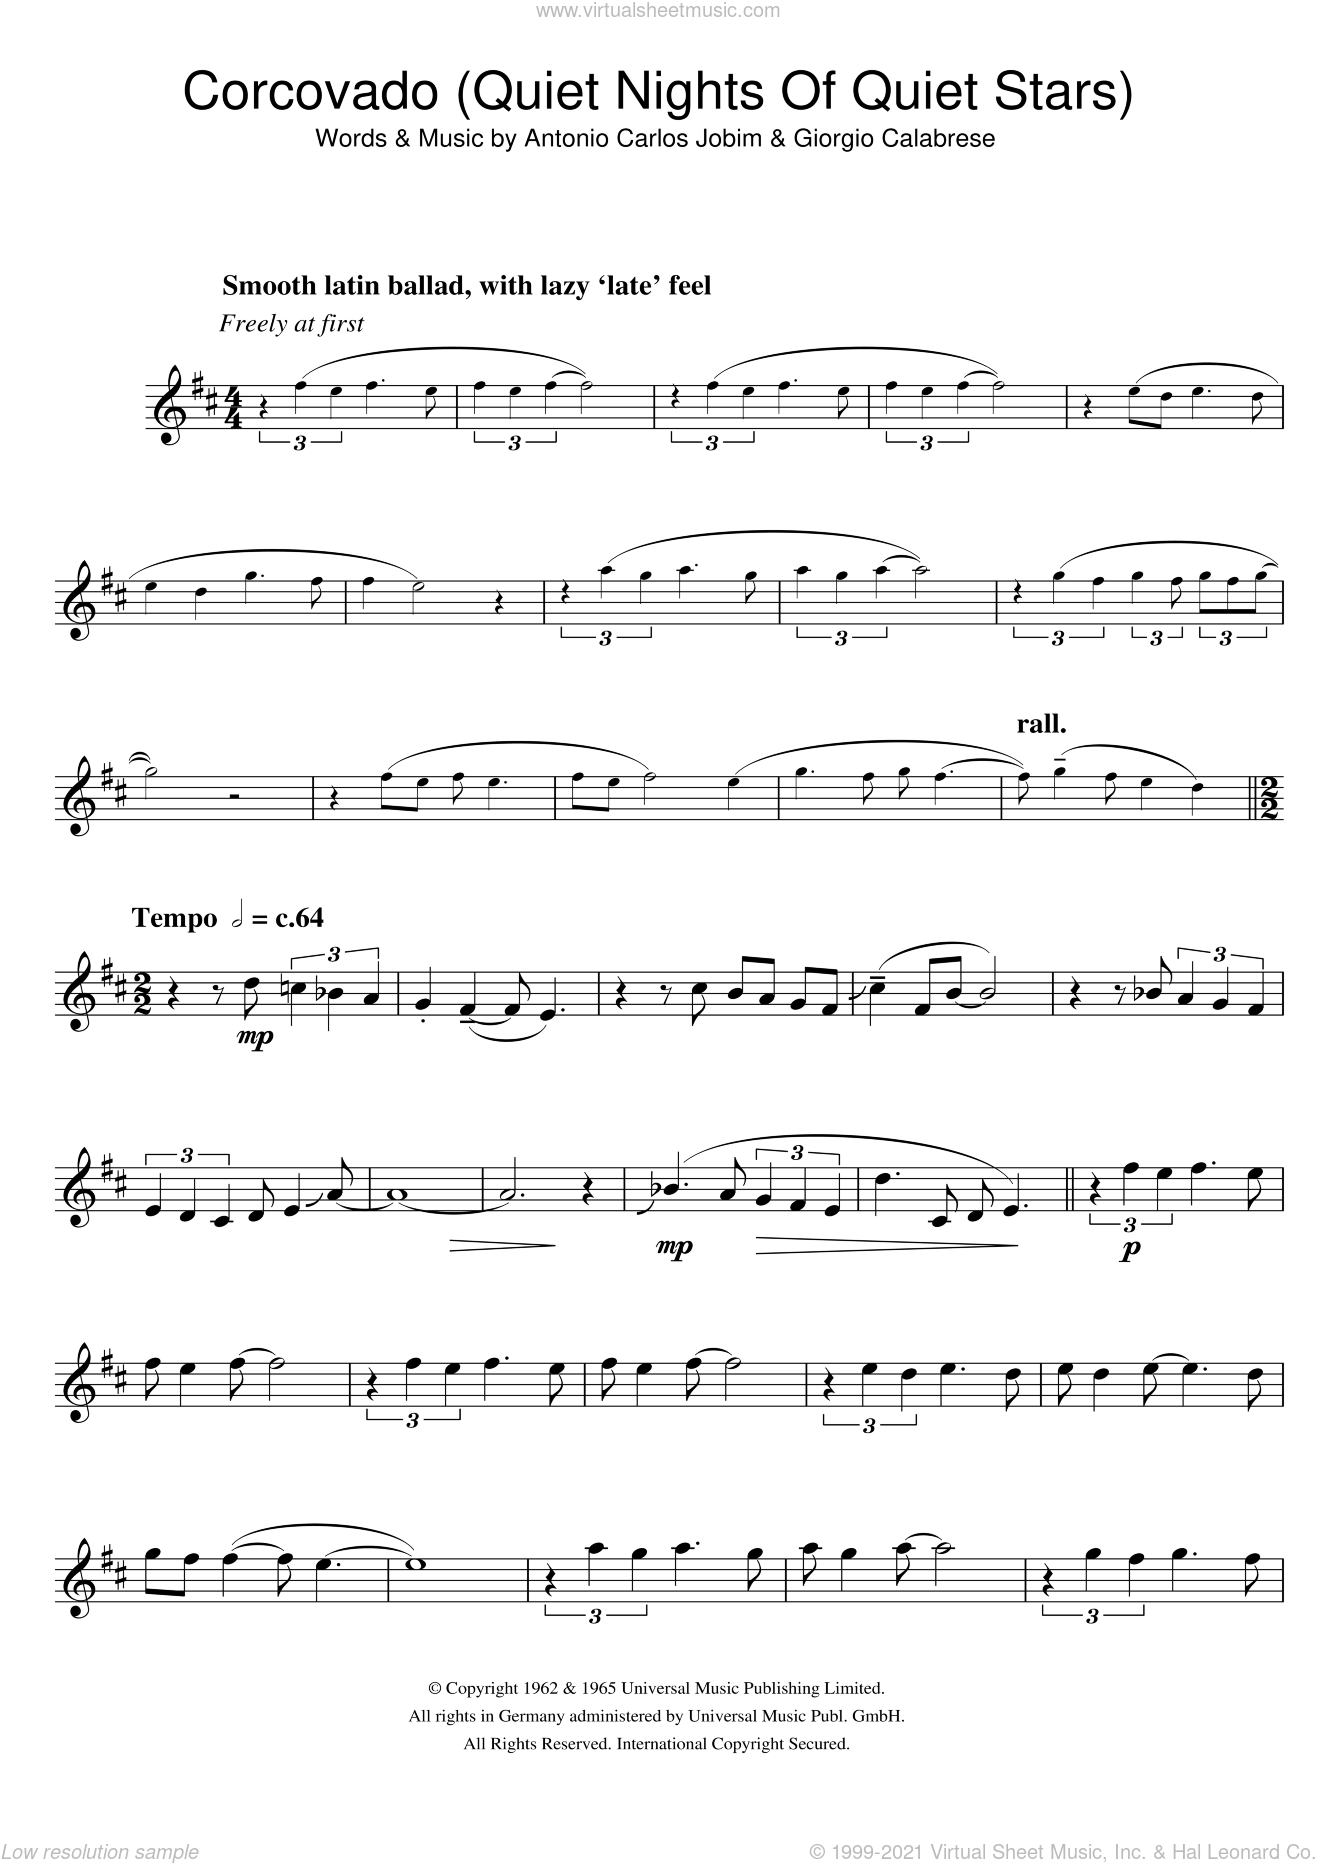 Corcovado (Quiet Nights Of Quiet Stars) sheet music for tenor saxophone solo by Antonio Carlos Jobim and Giorgio Calabrese, intermediate skill level